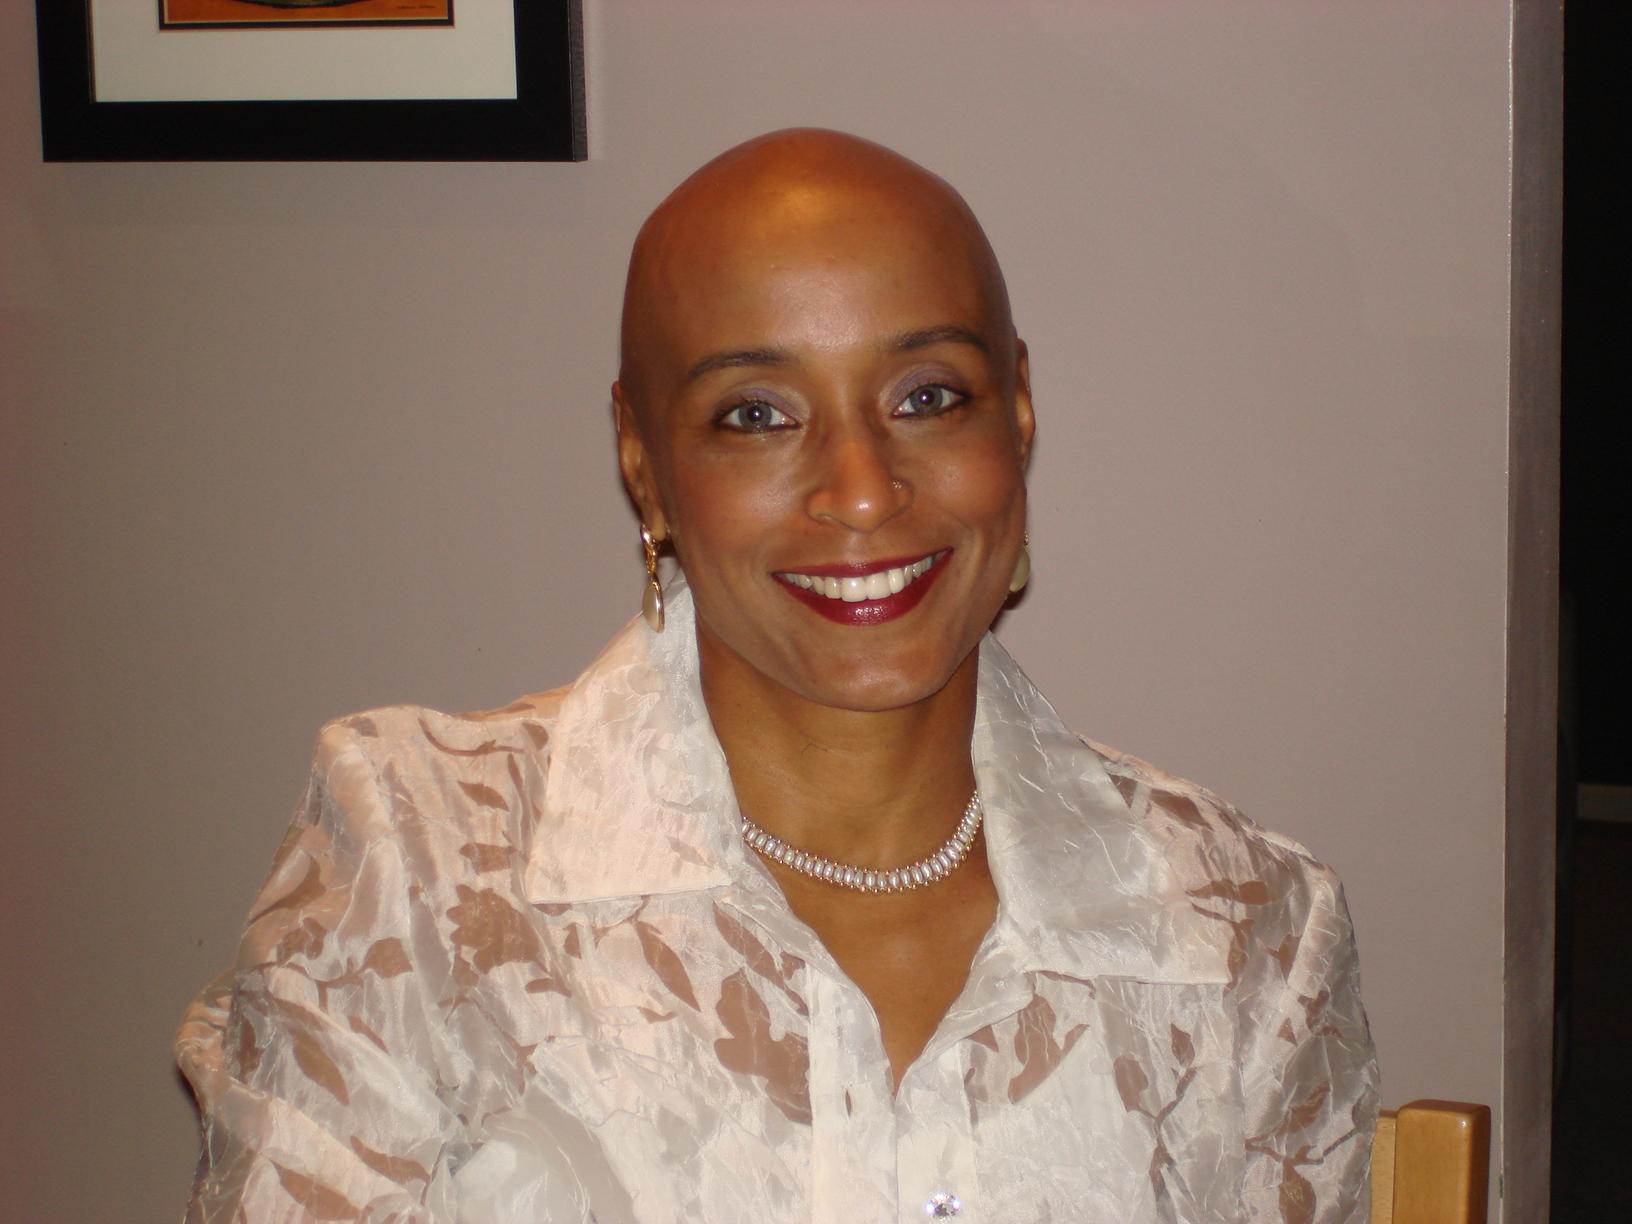 Victoria Proctor